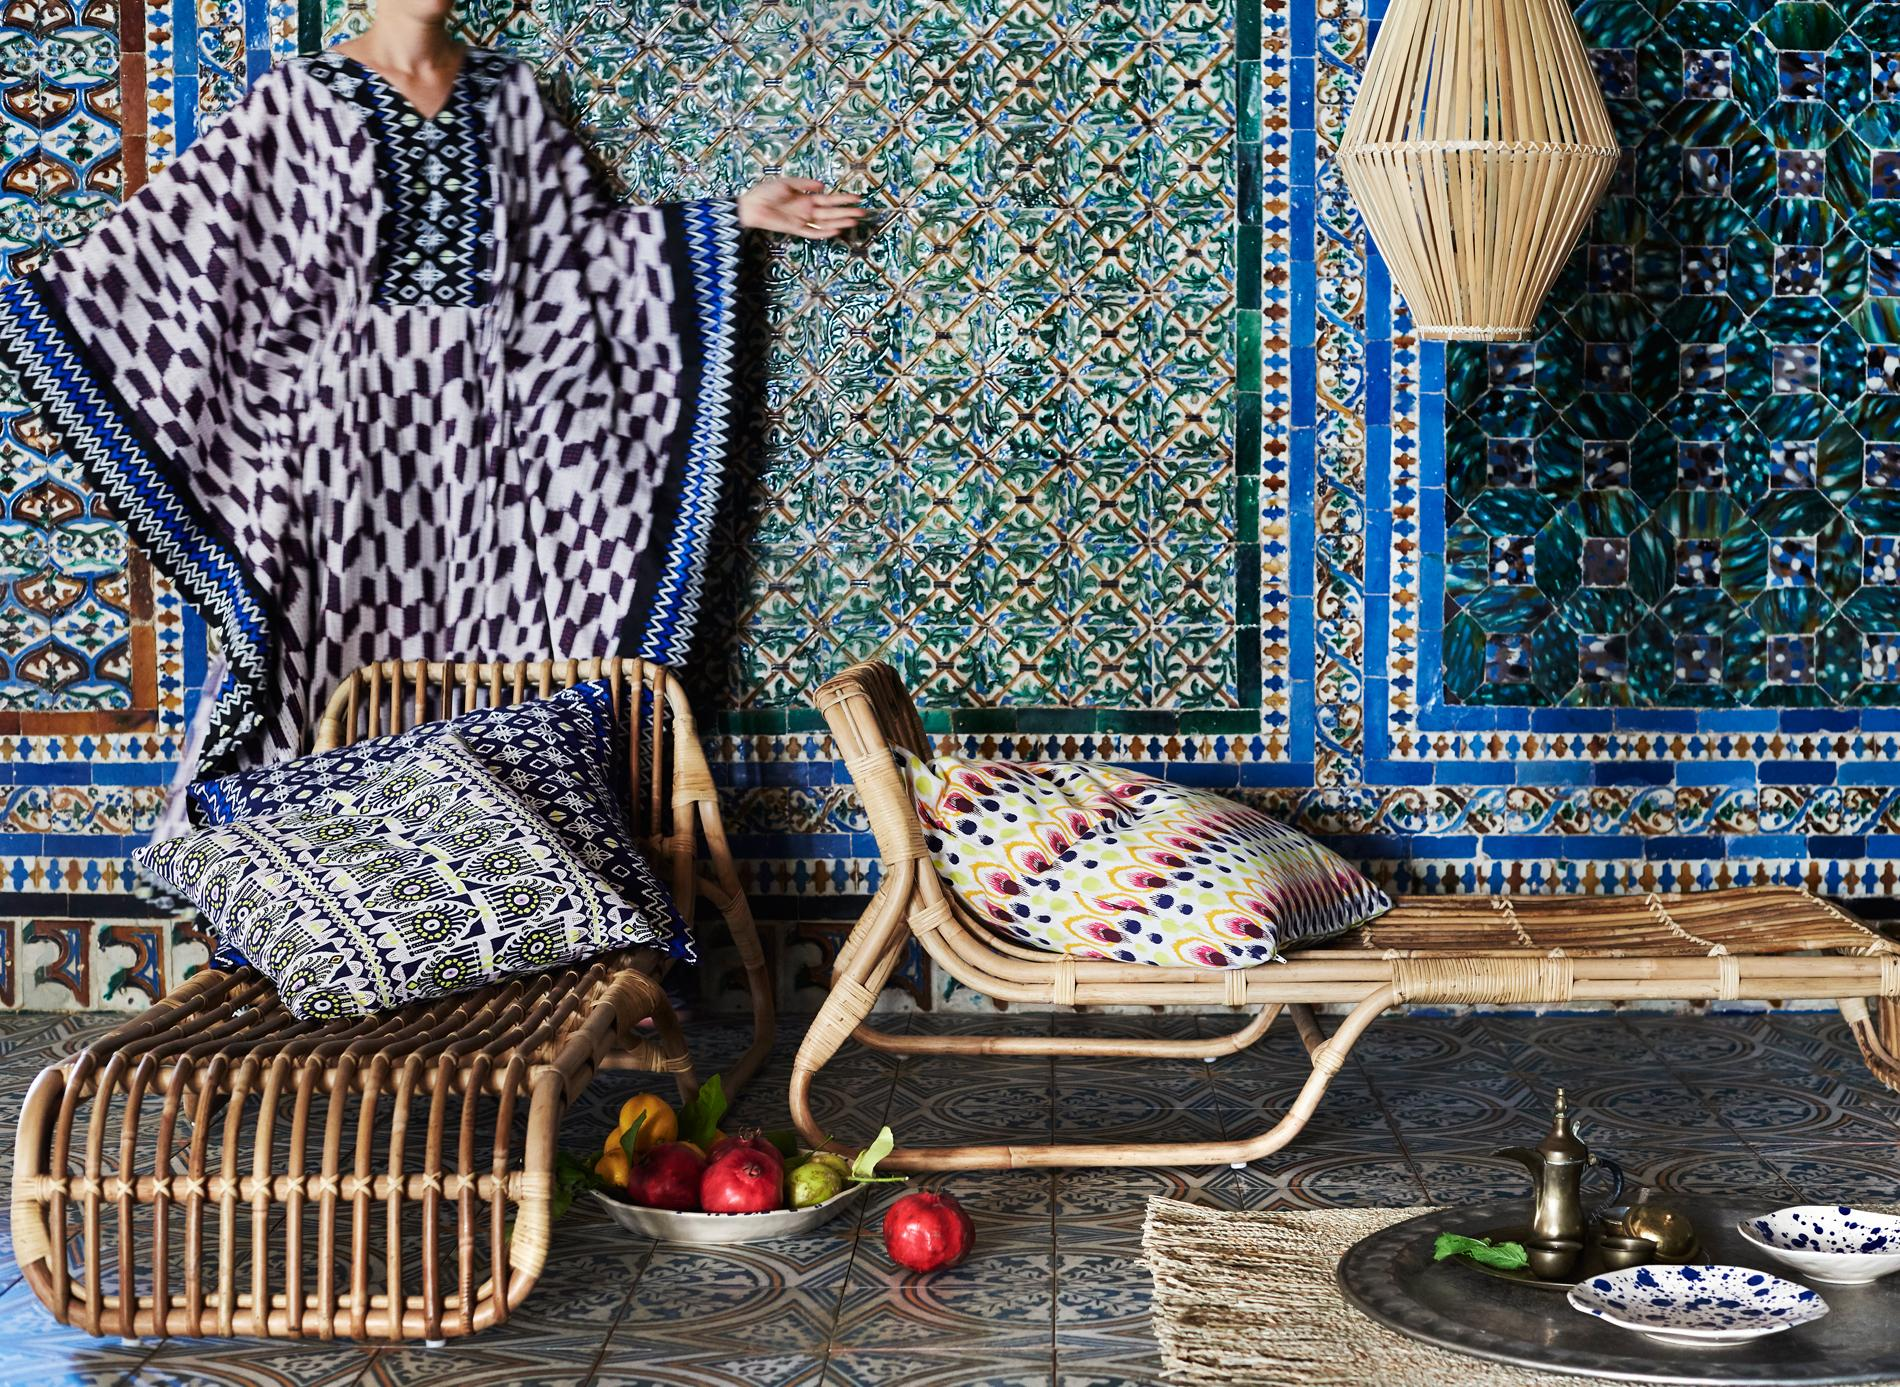 le rotin fait son grand retour chez ikea madame figaro. Black Bedroom Furniture Sets. Home Design Ideas